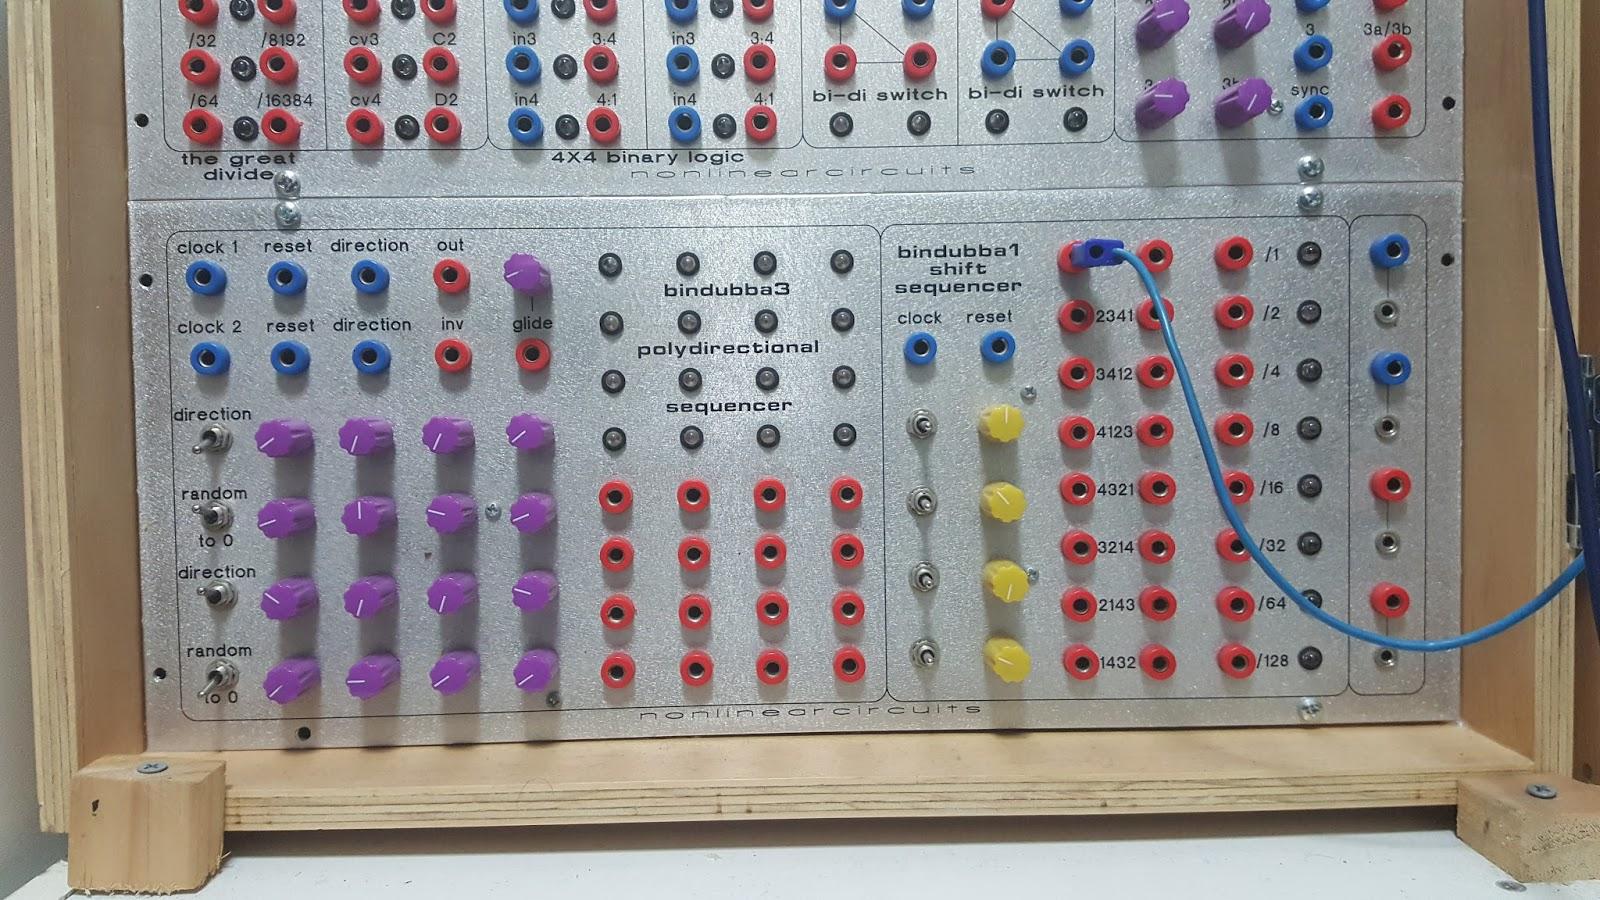 JonDent - Exploring Electronic Music: Bindubba sequencer